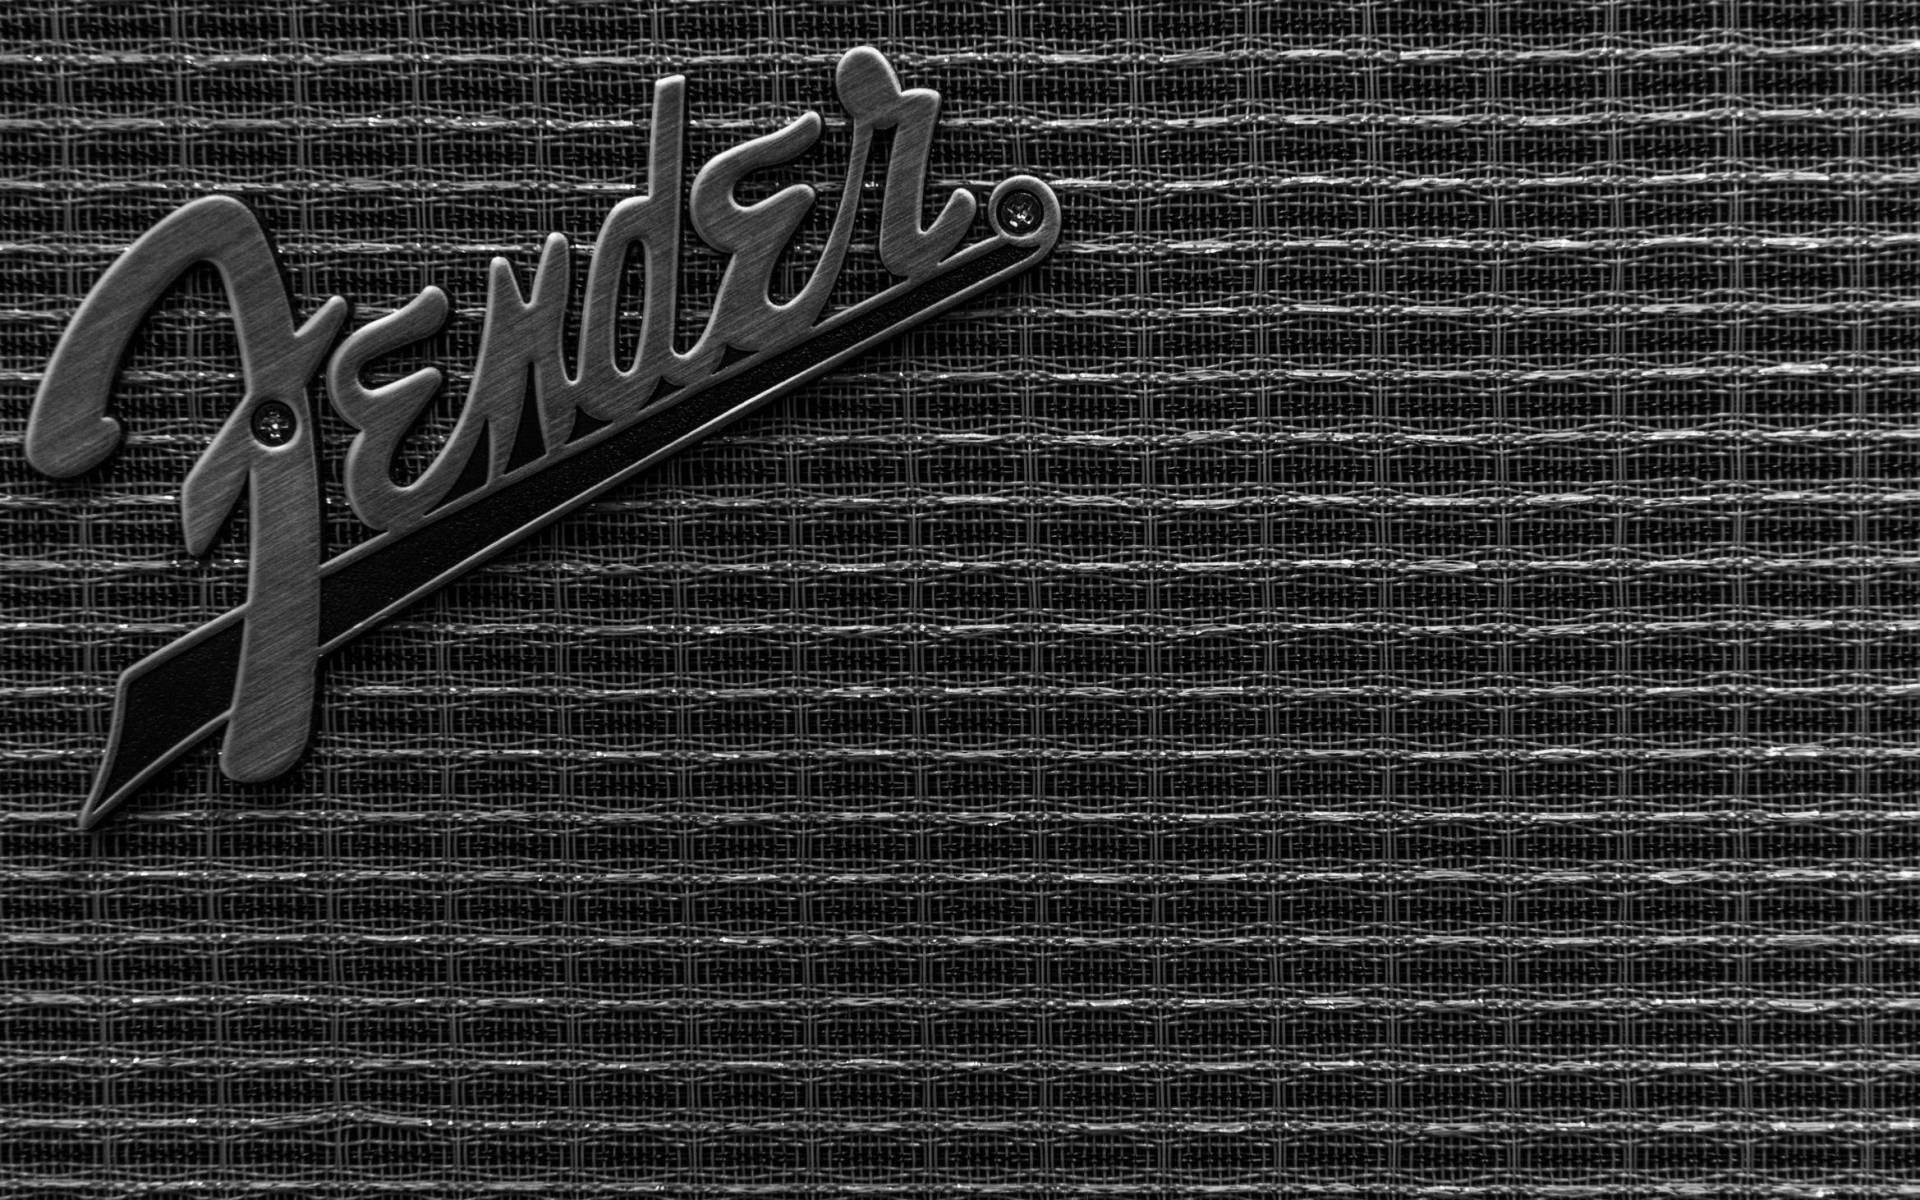 Fender guitar amp close-up [1920×1200]